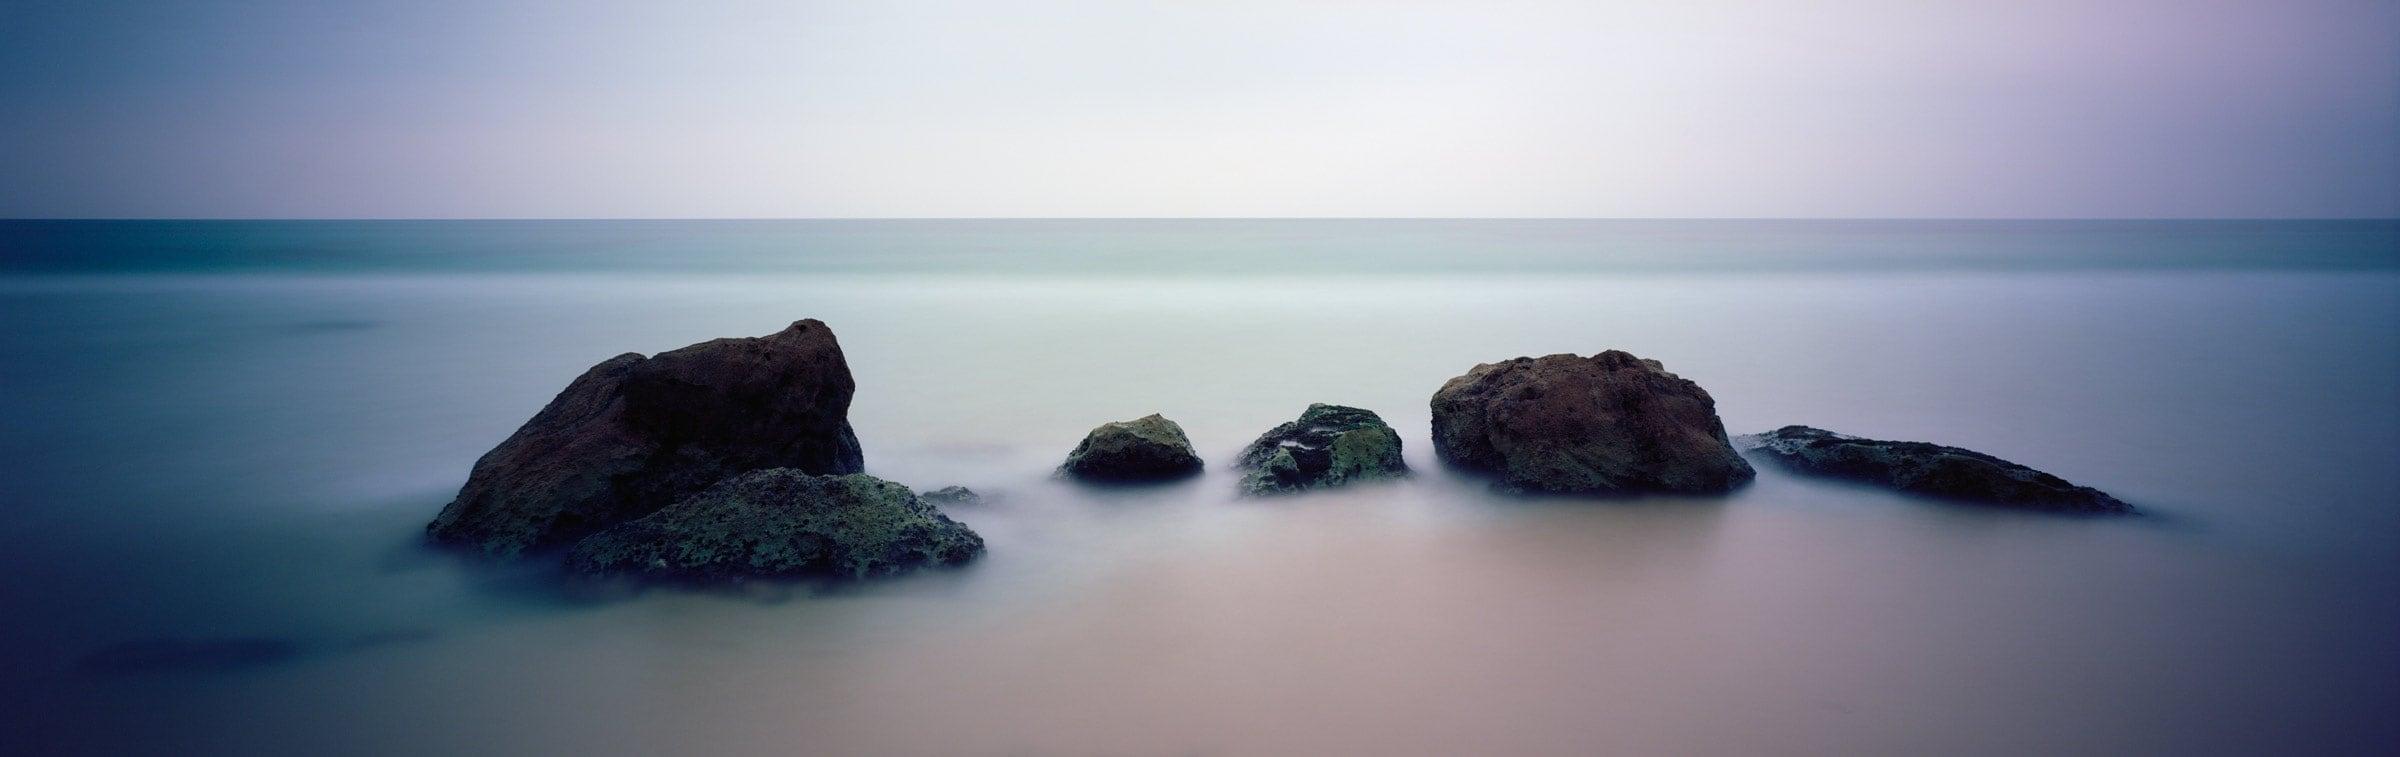 Mediterranean sea rocks abstract